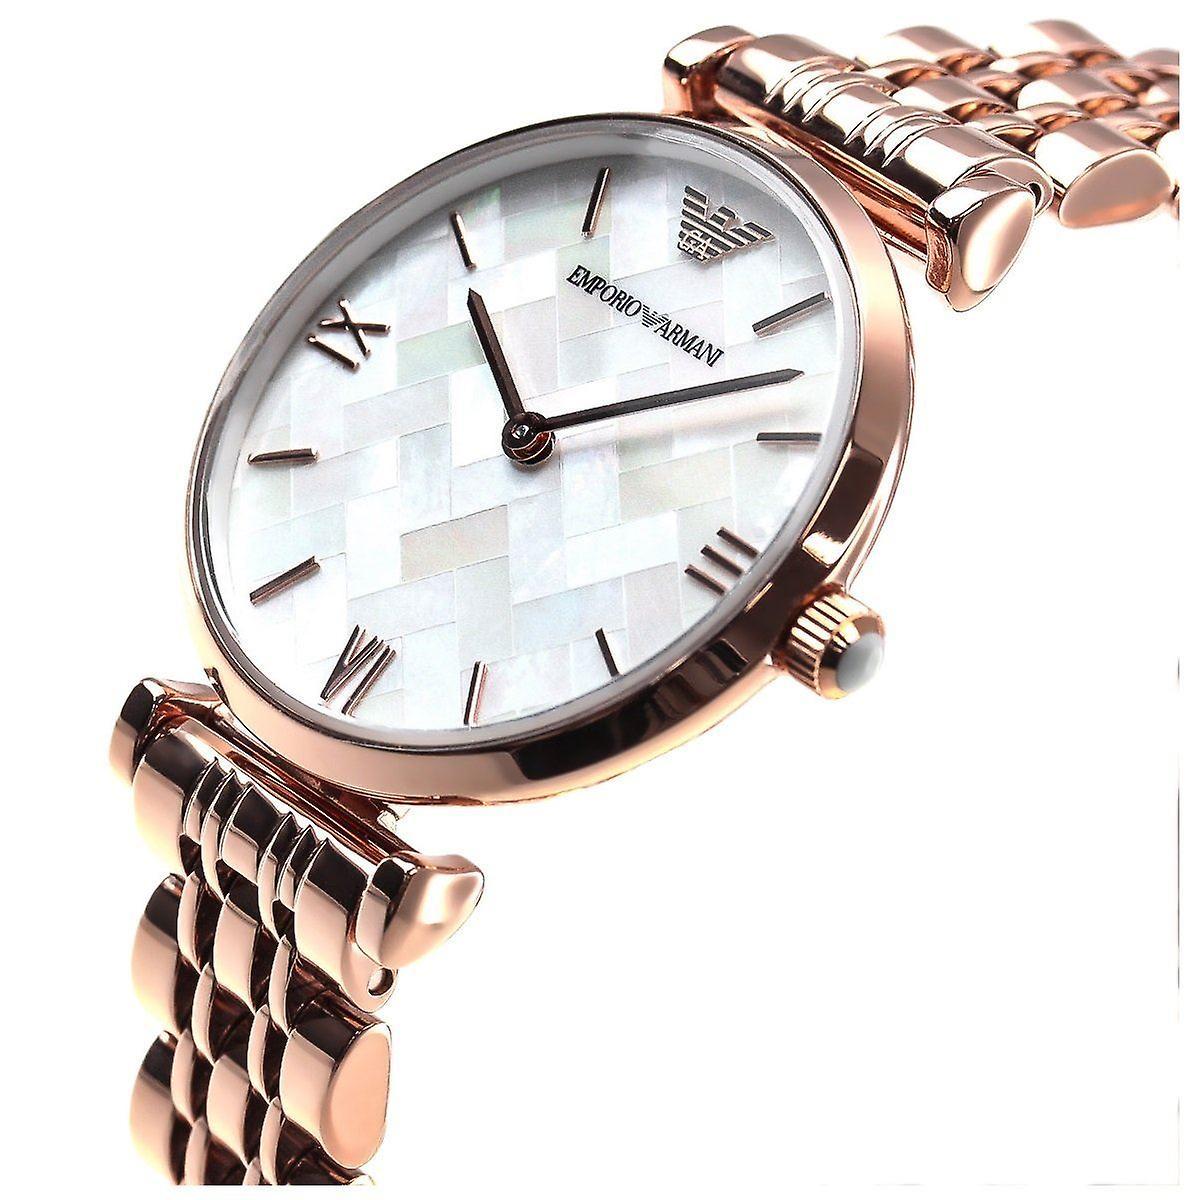 Emporio Armani Mesdames Womens Wrist Watch acier inoxydable AR11110